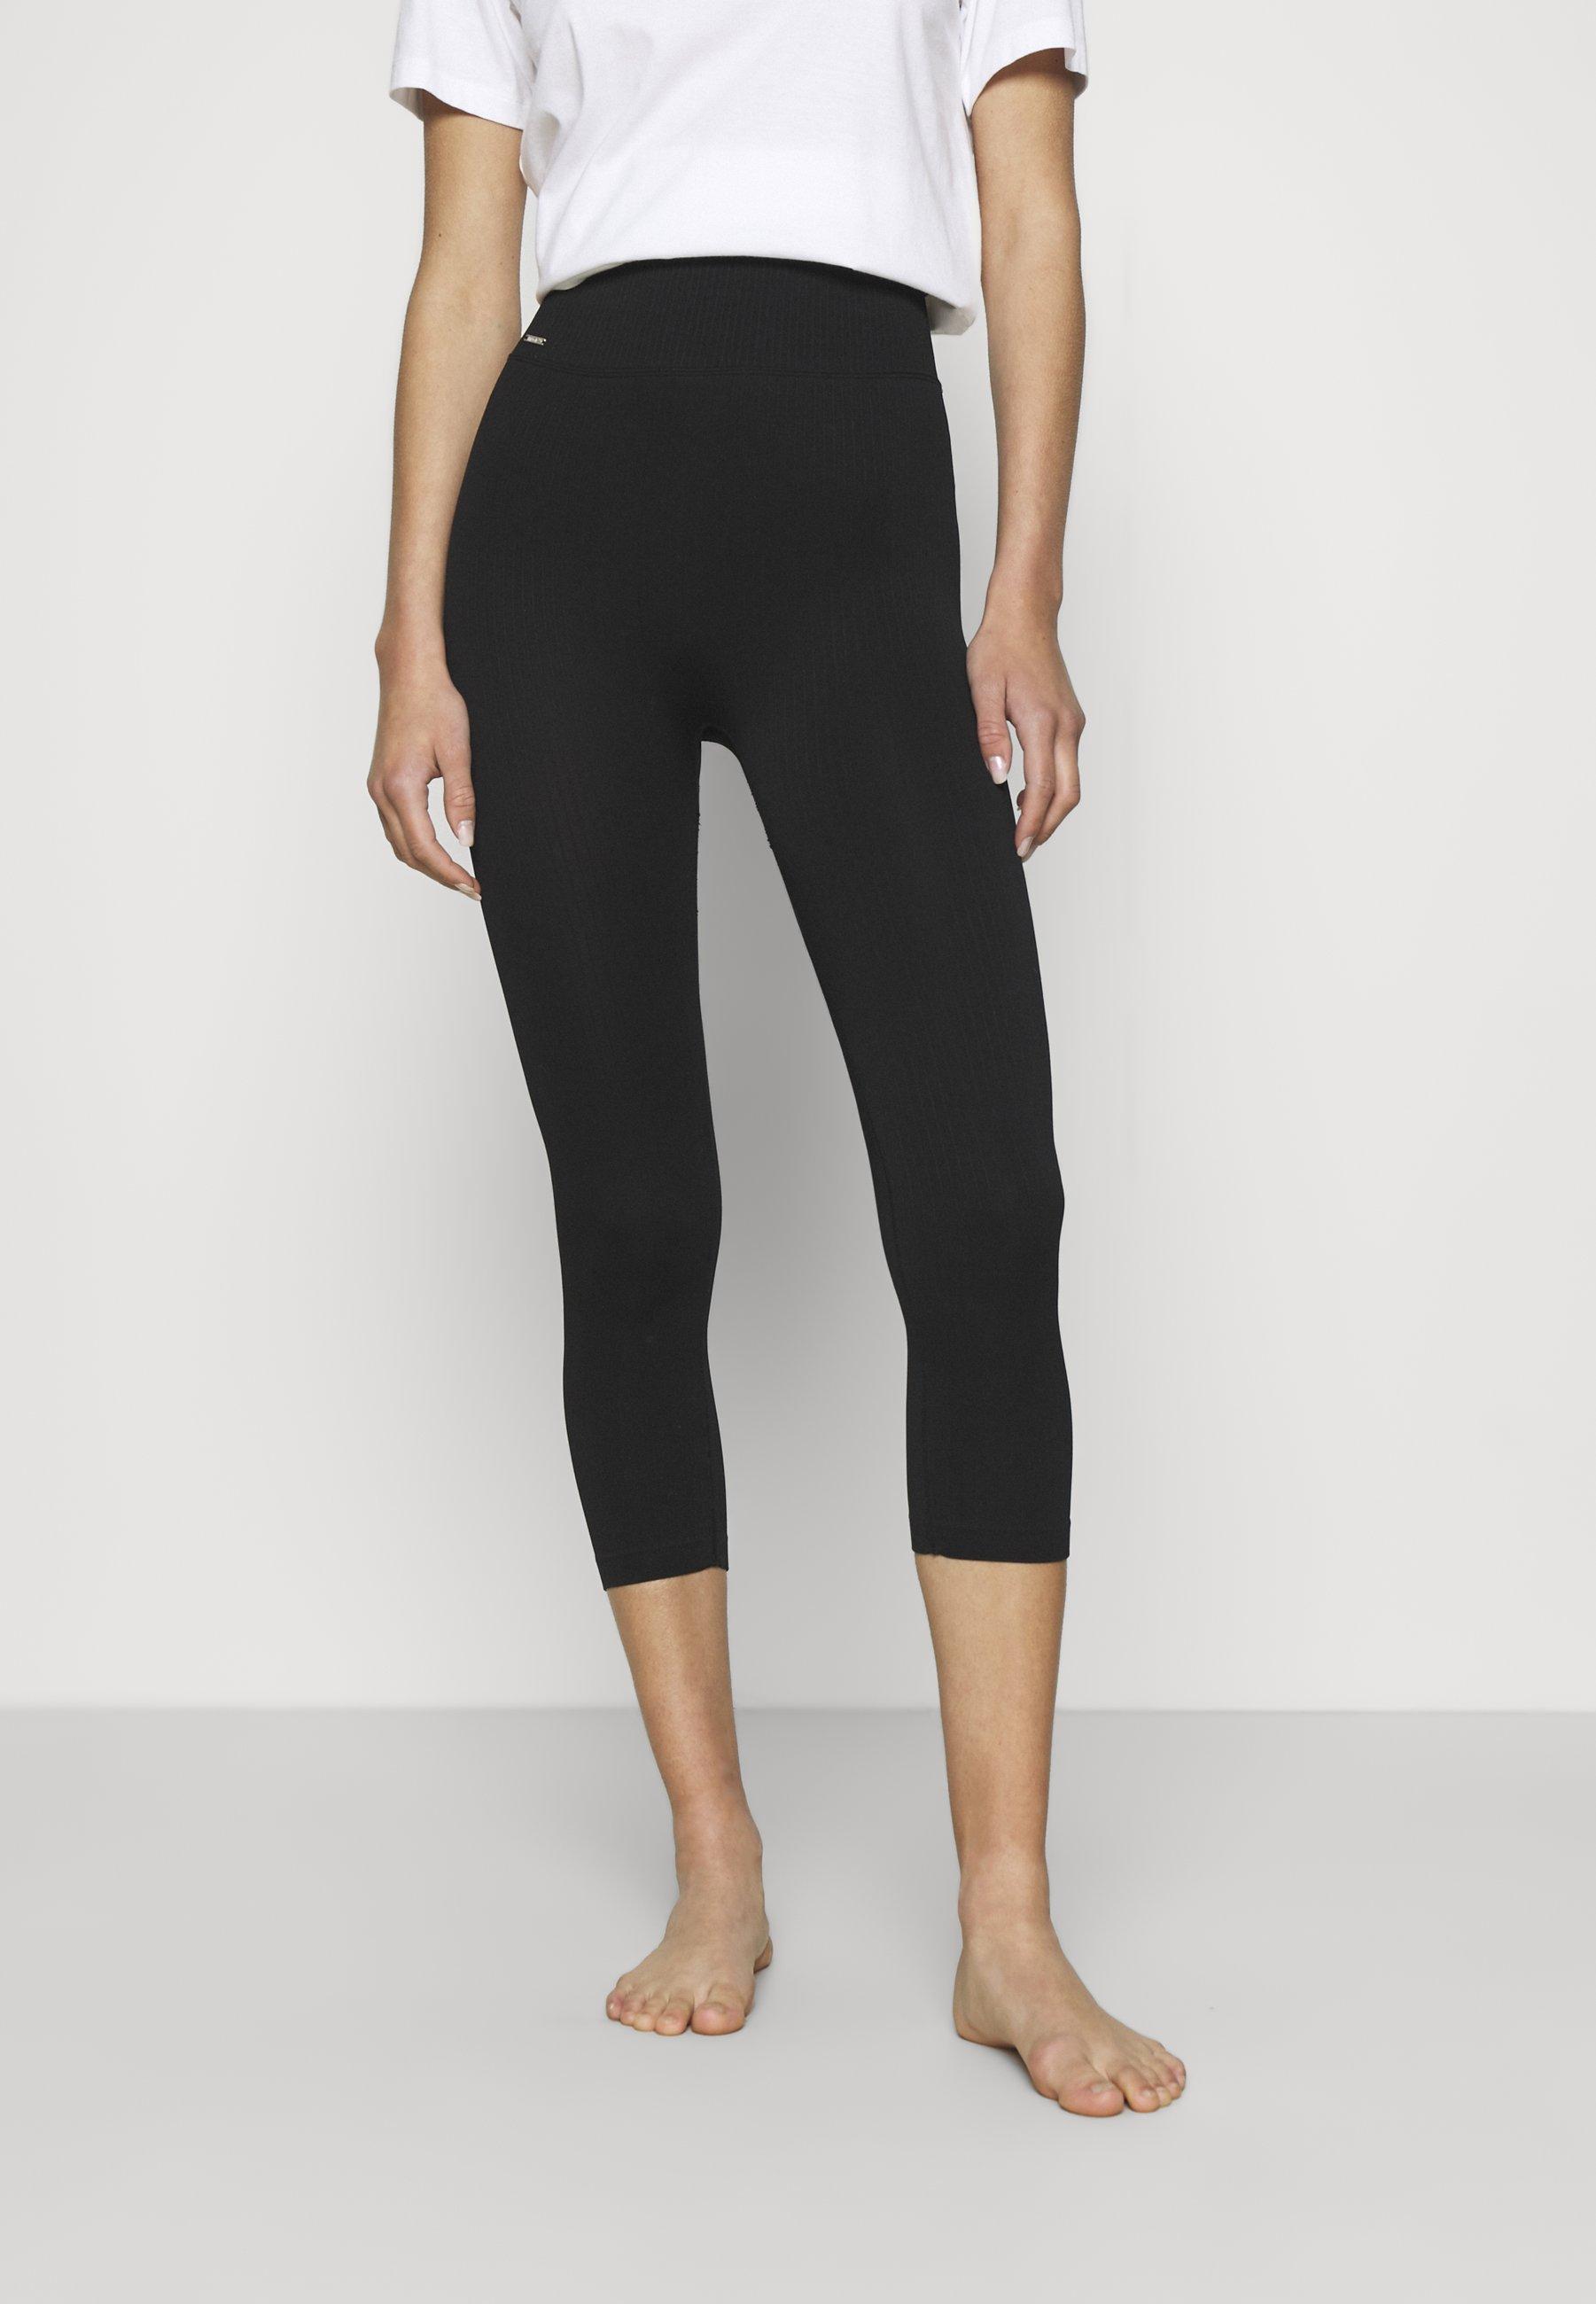 Donna LOUNGE CROPPED PANTS - Pantaloni del pigiama